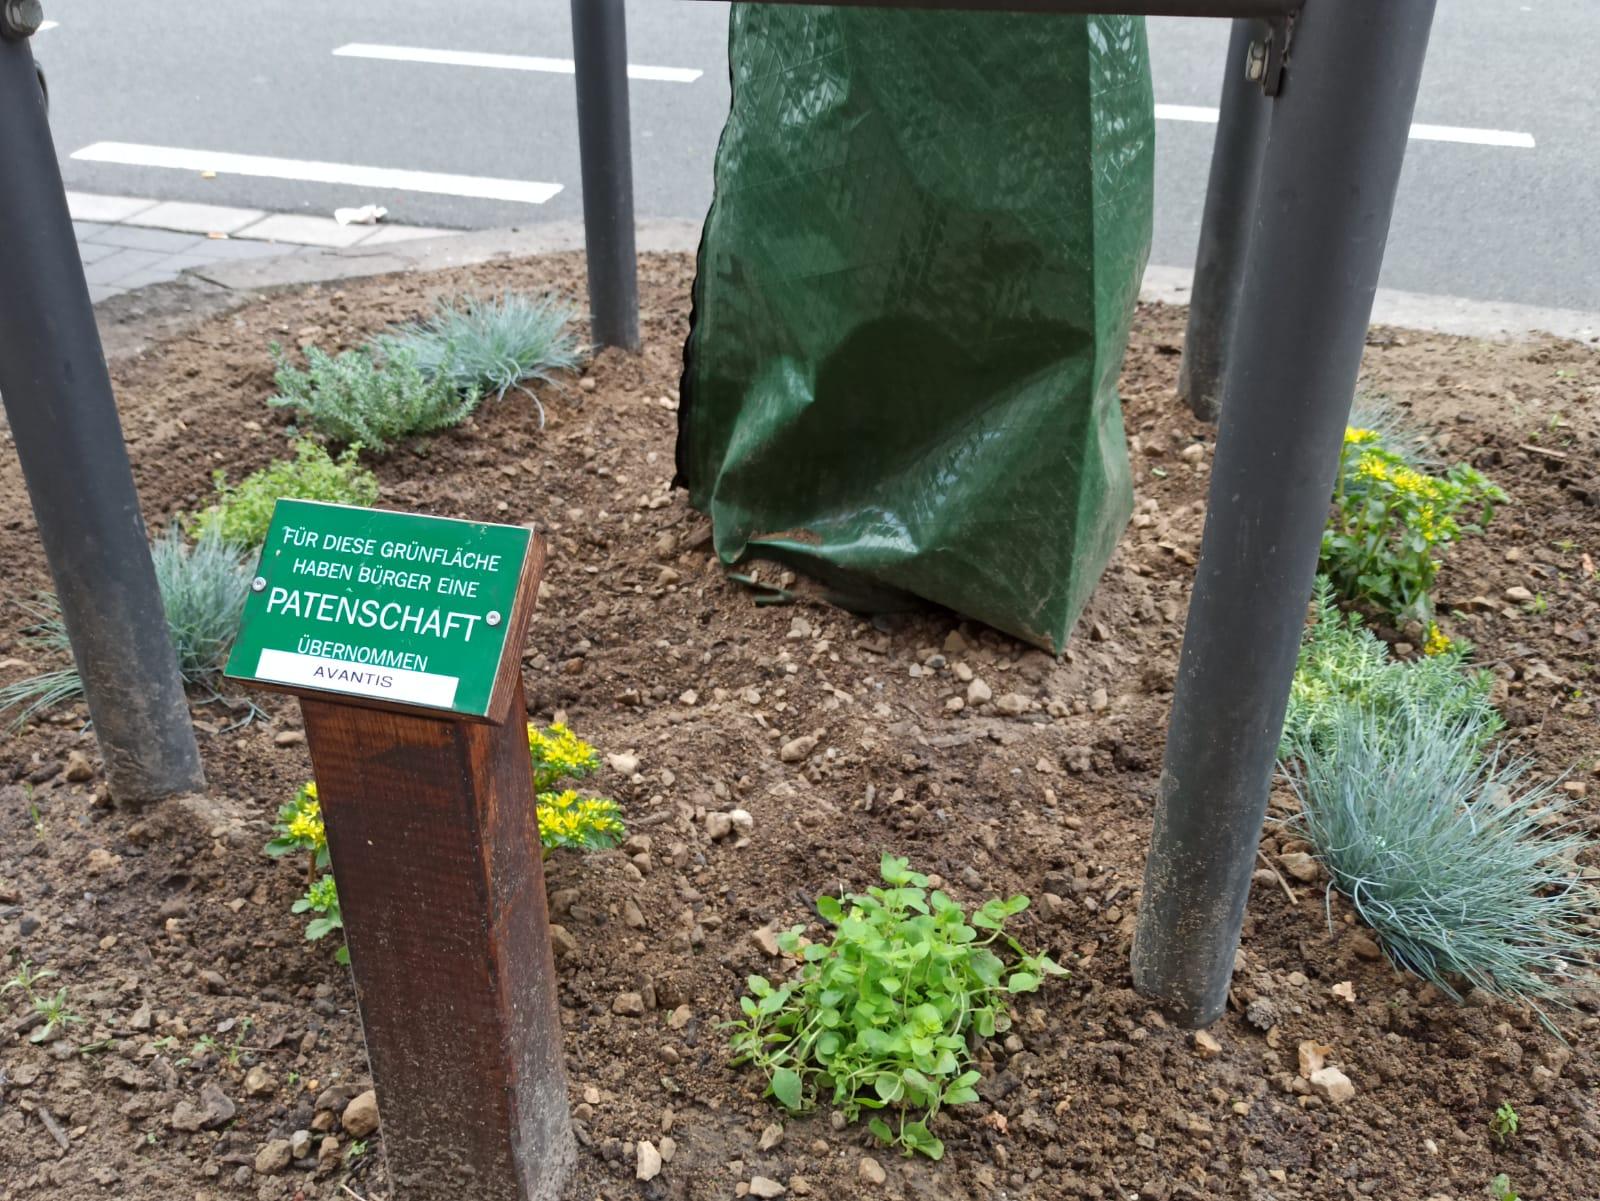 Grünfläche in Aachen Burtscheid Patenschaft